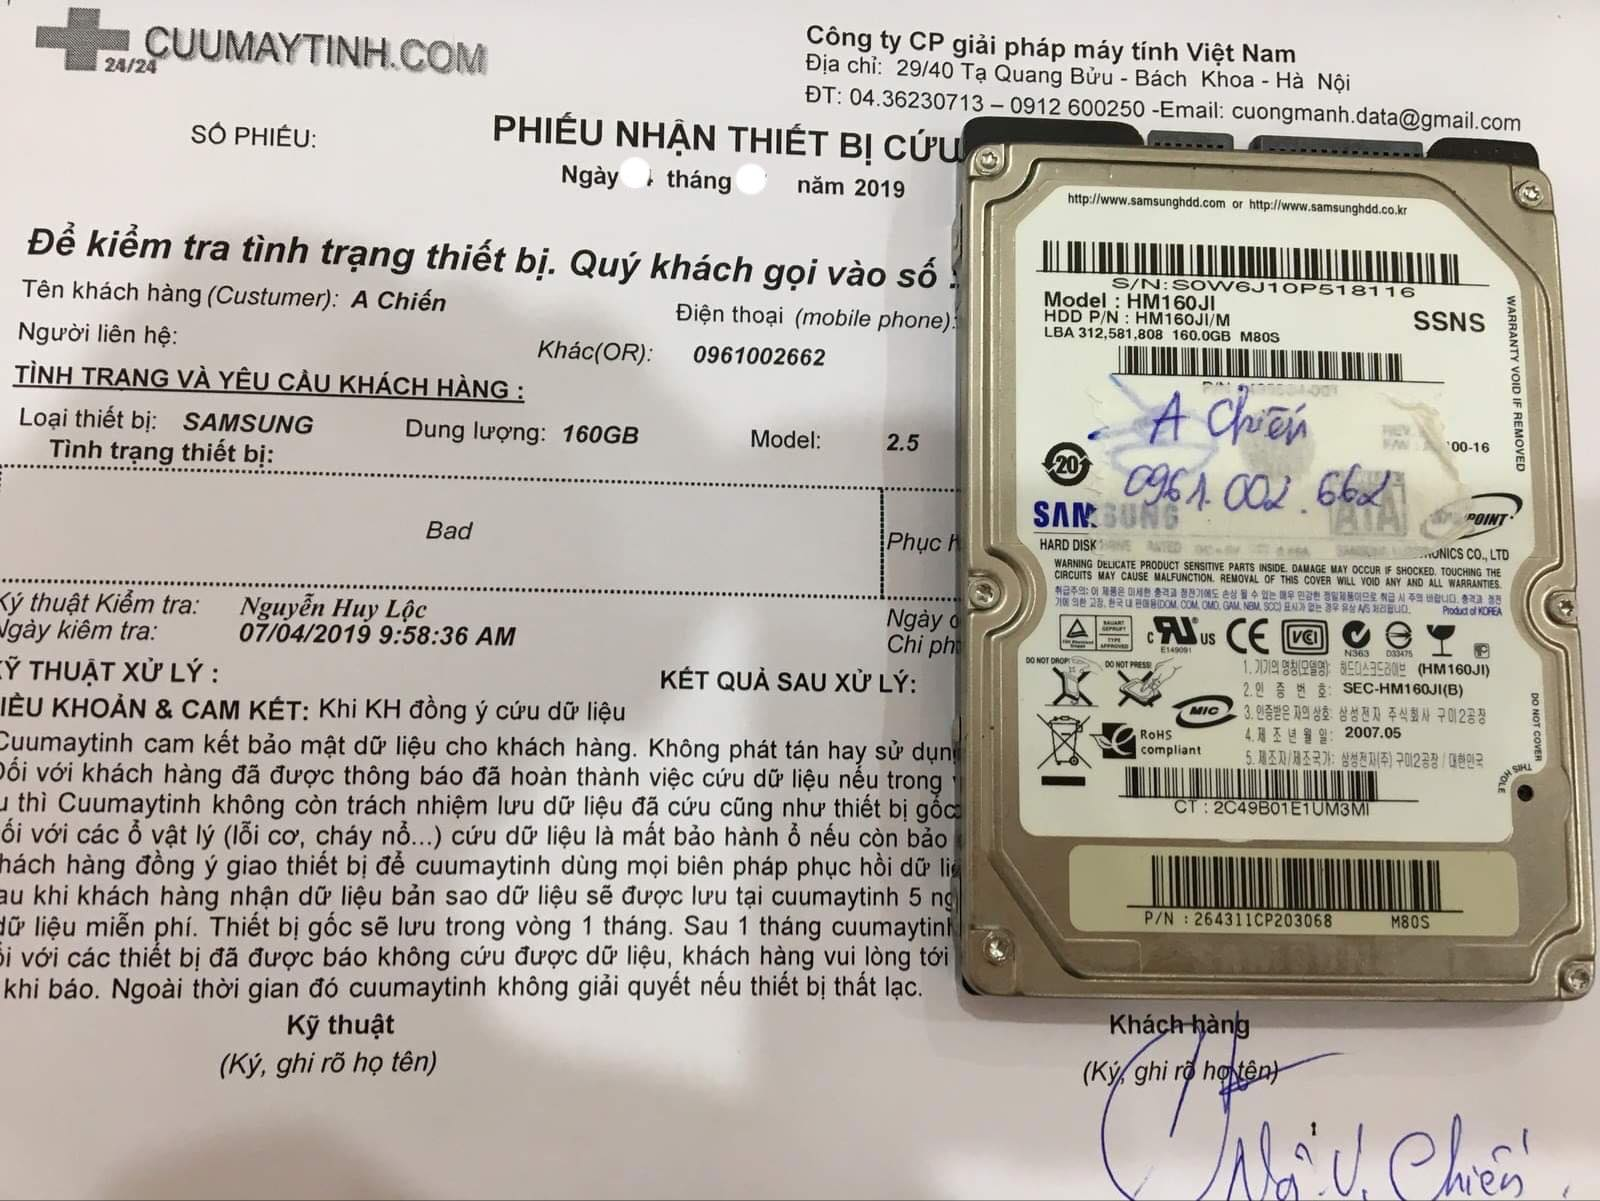 Cứu dữ liệu ổ cứng Samsung 160GB bad 14/09/2019 - cuumaytinh